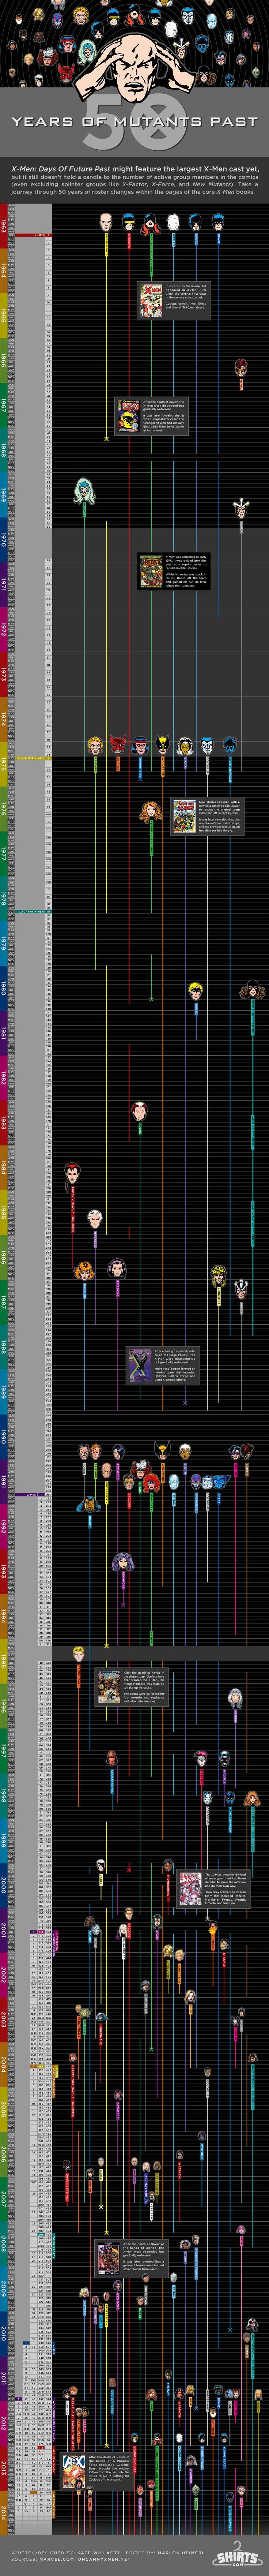 50 years of mutants past. X-Men-Infographic